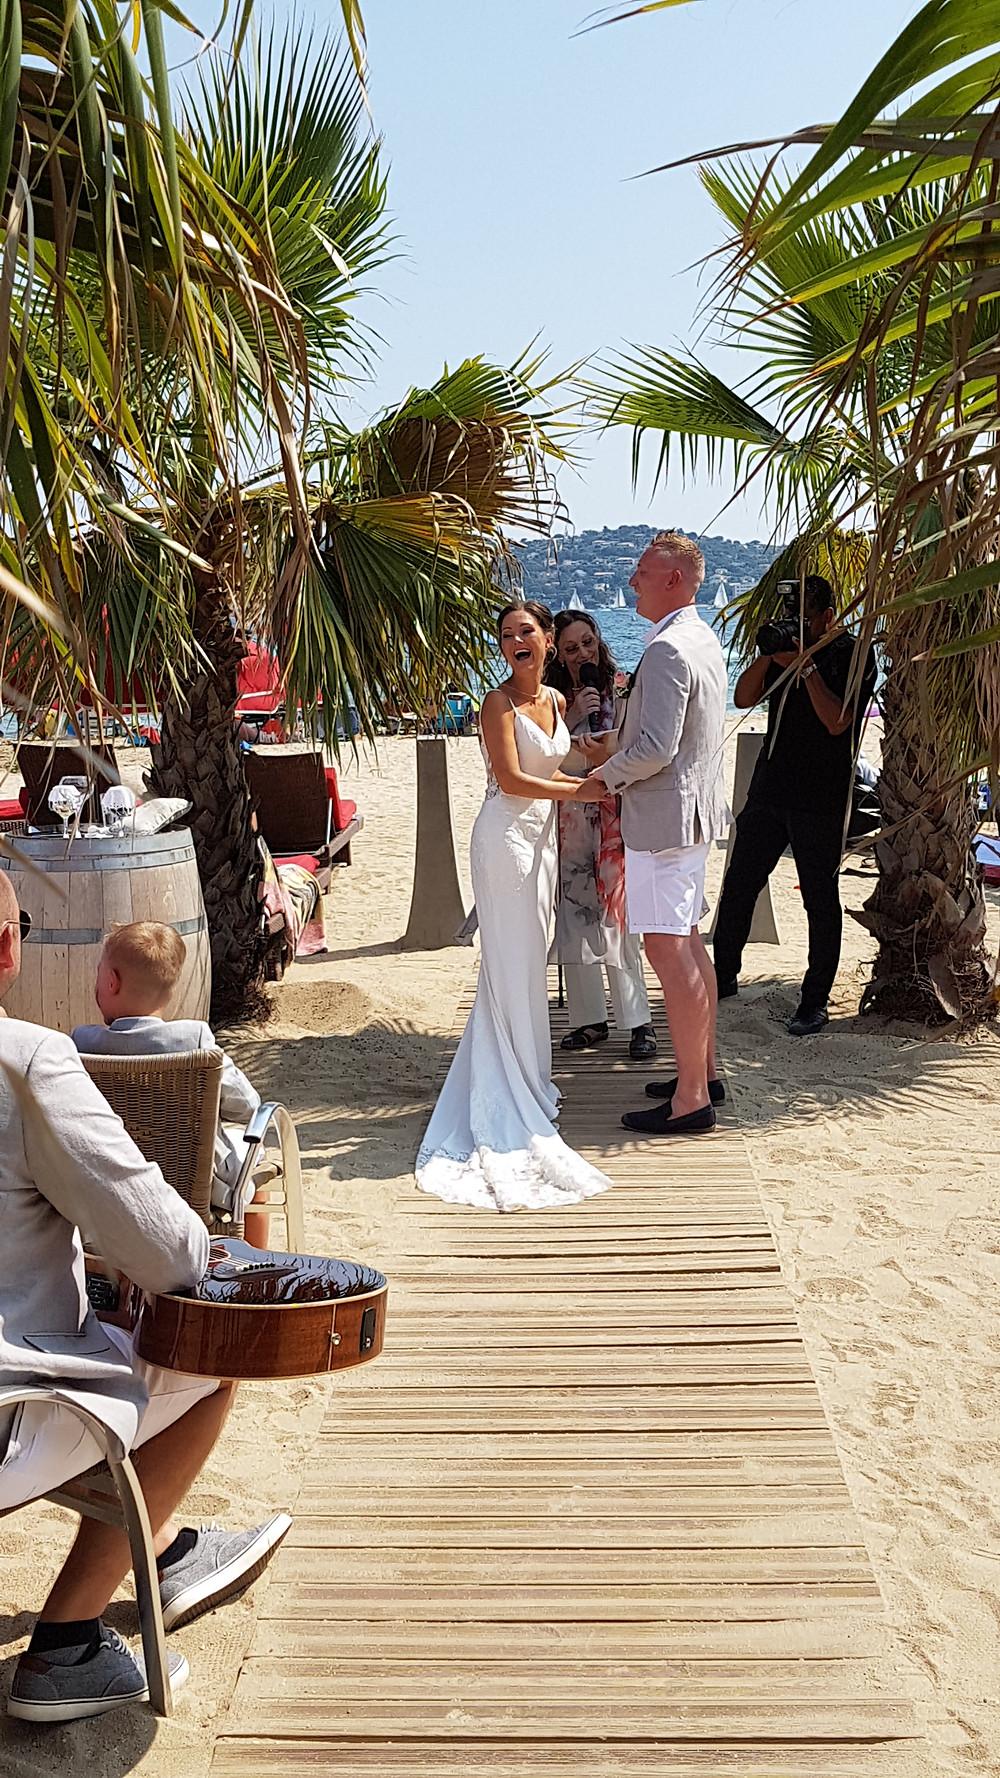 A family wedding at the Restaurant de la Plage, Grimaud, with Saint-Tropez as the back-drop!